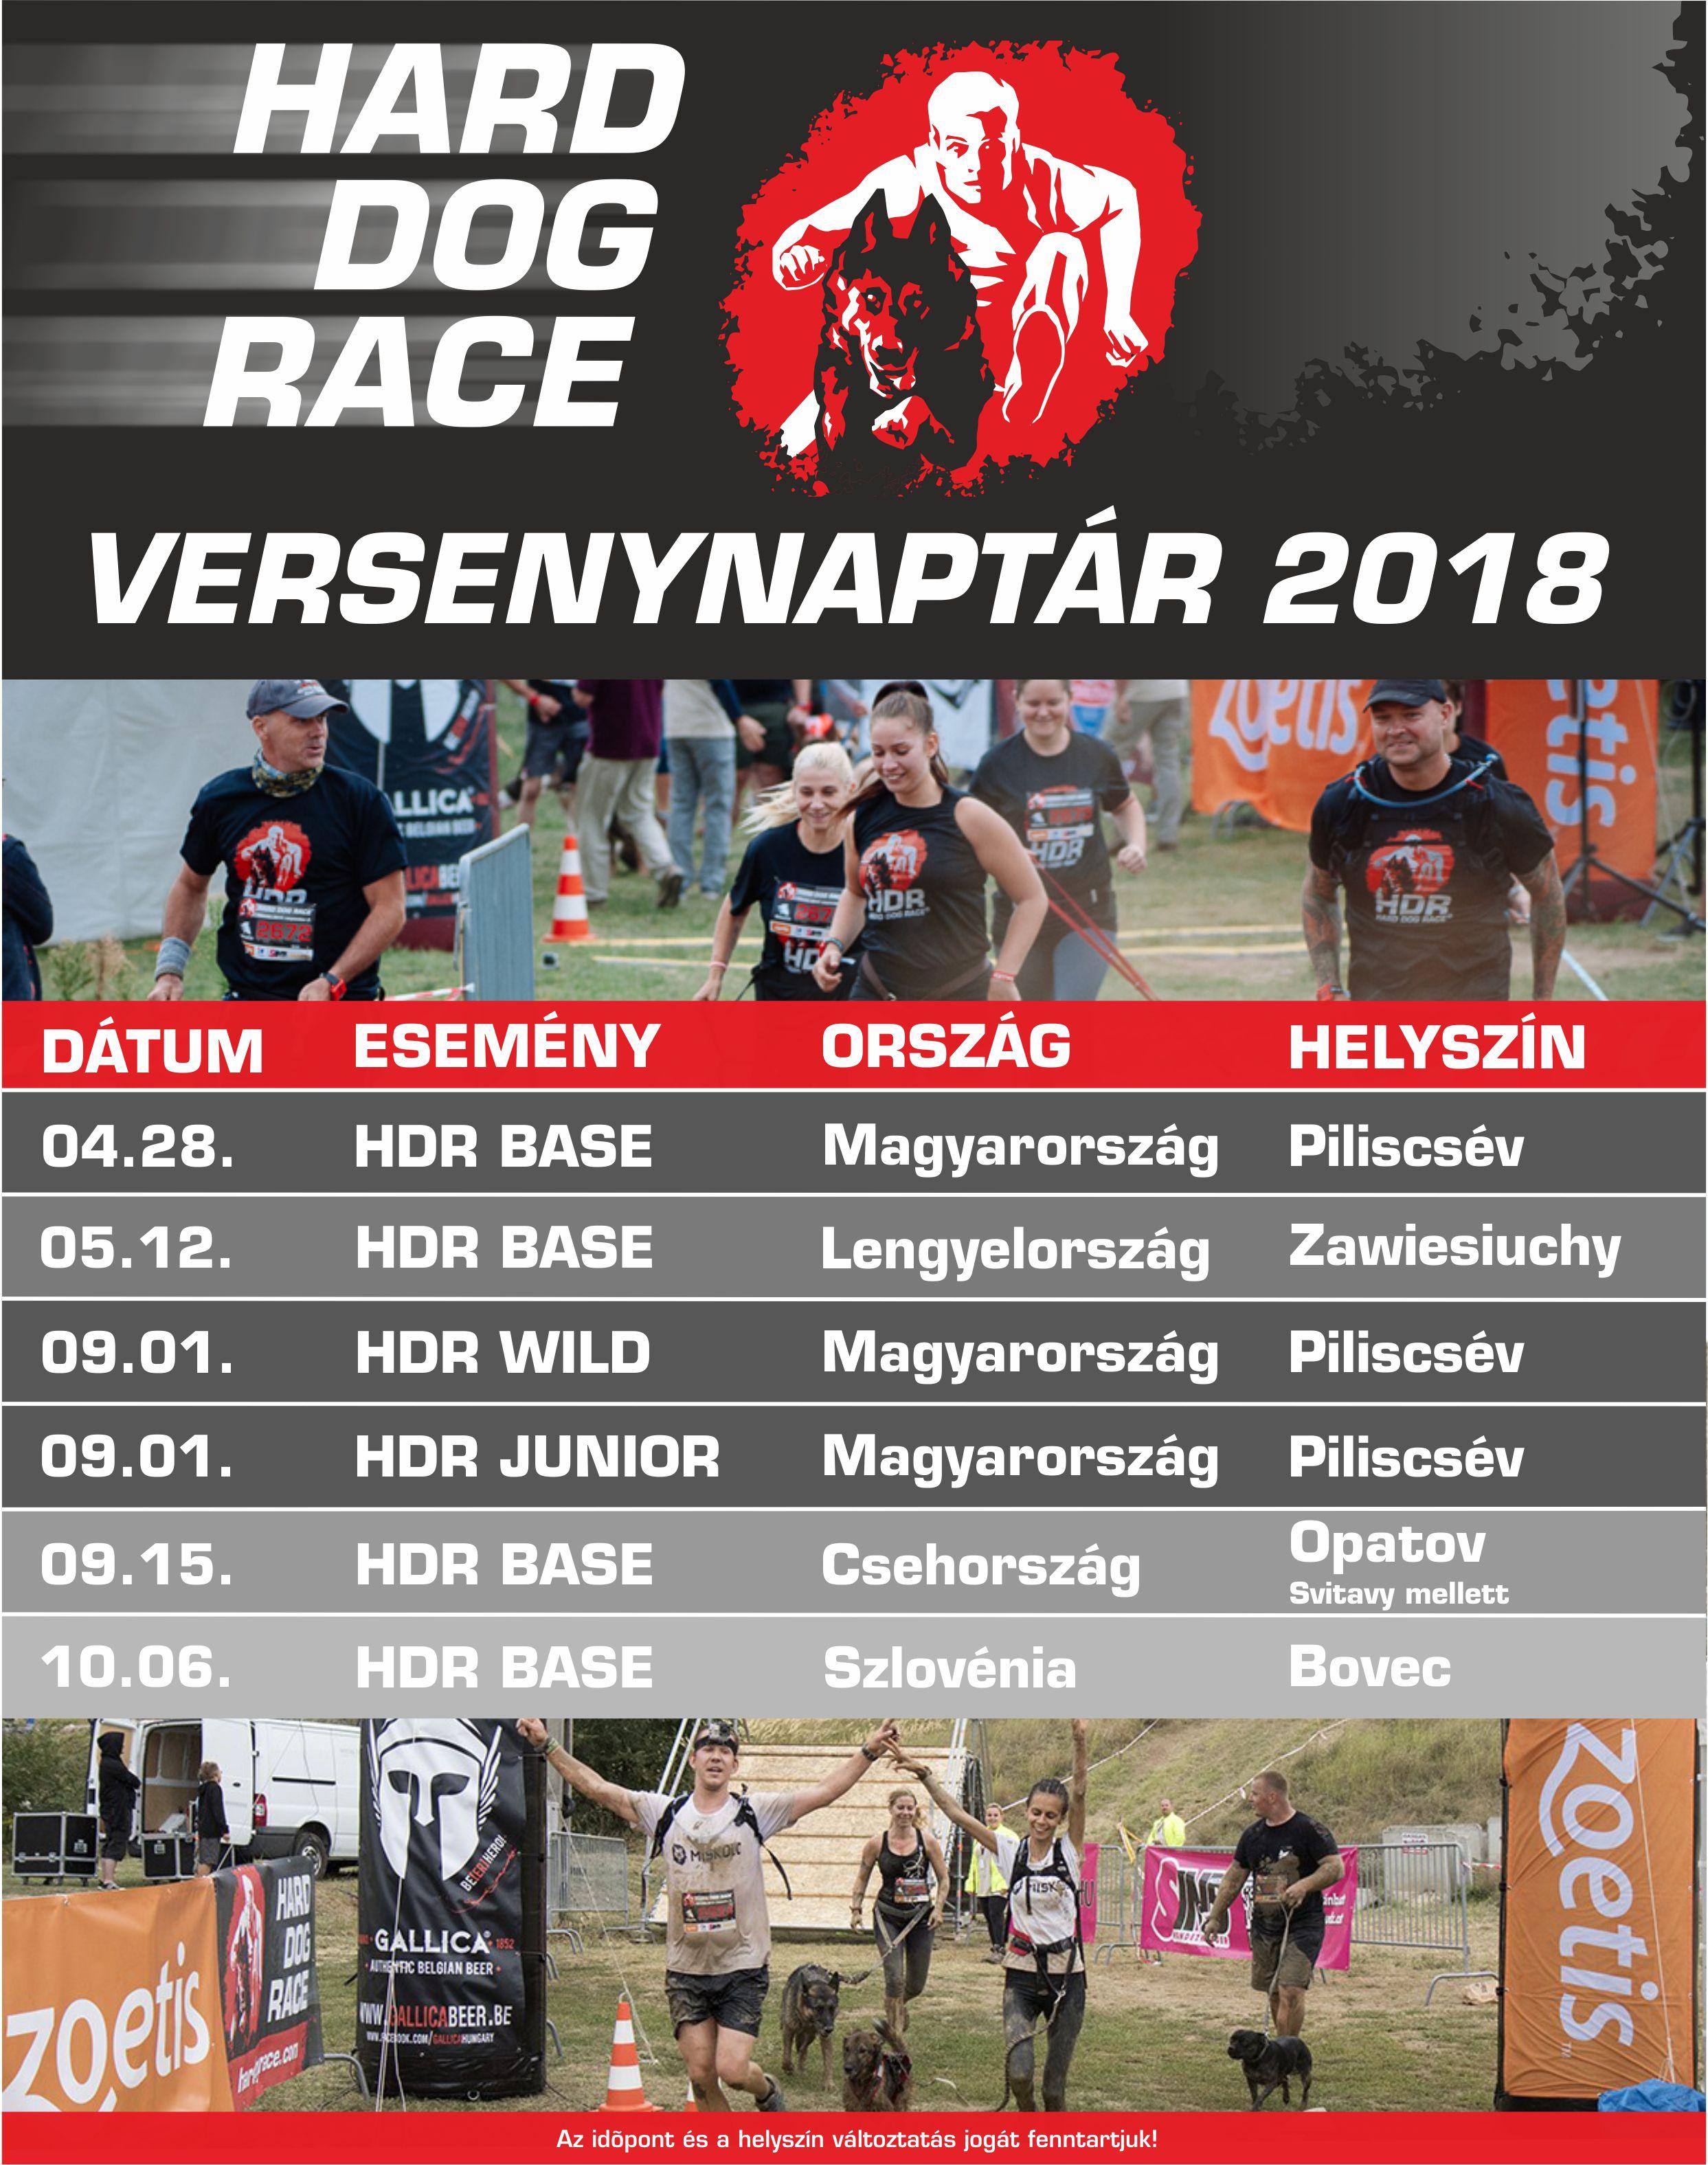 versenynaptar_2018_final_hu.jpg